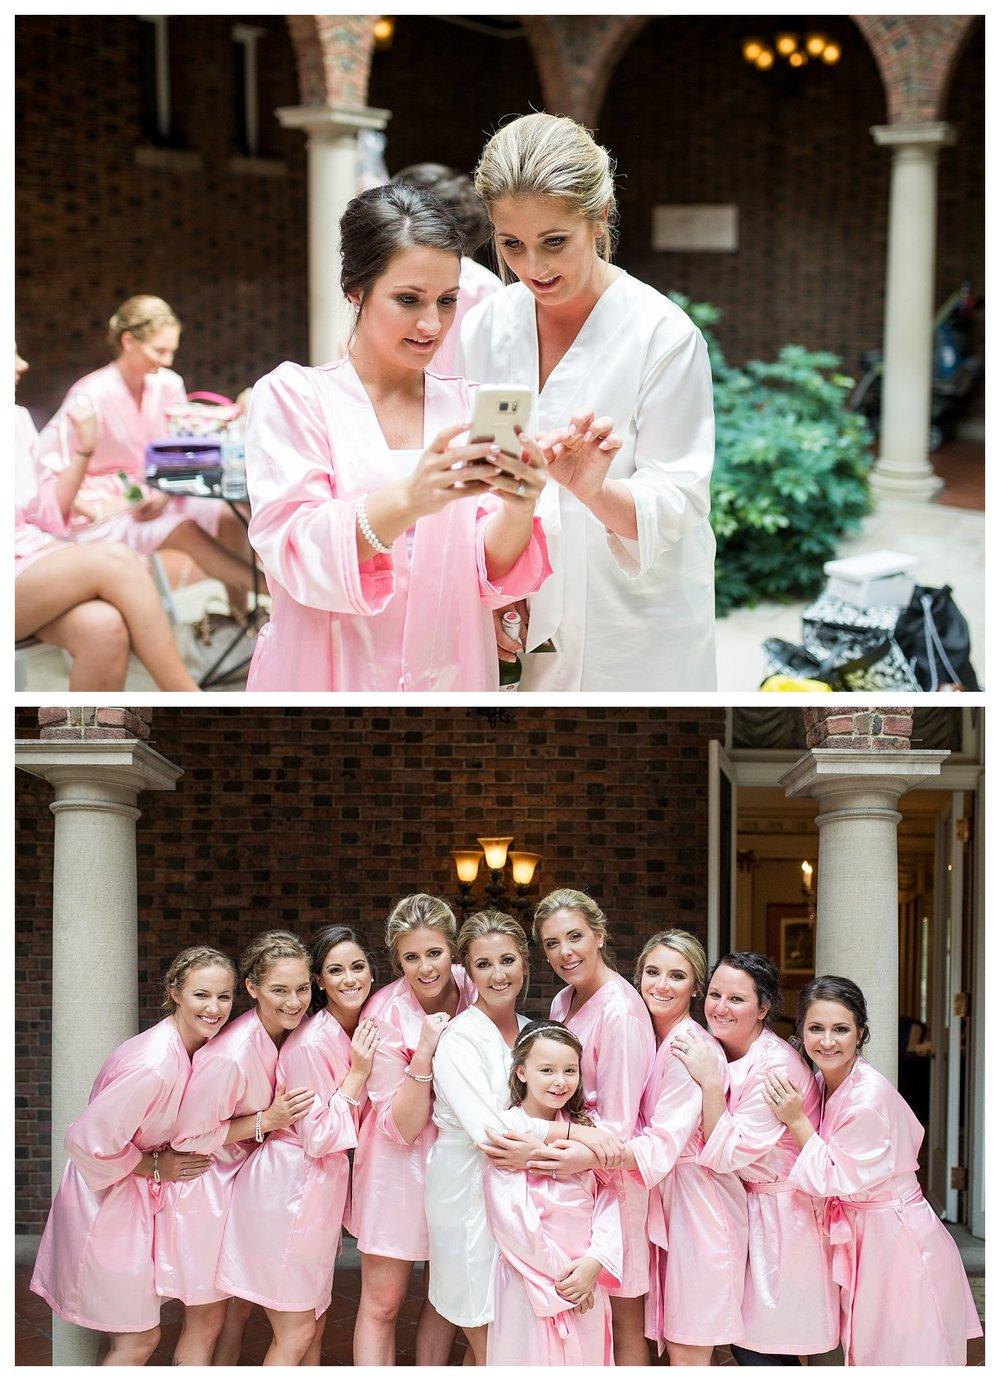 laurel-court-wedding-everleigh-photography-cincinnati-wedding-photographer-northern-ky-wedding-photographer-09